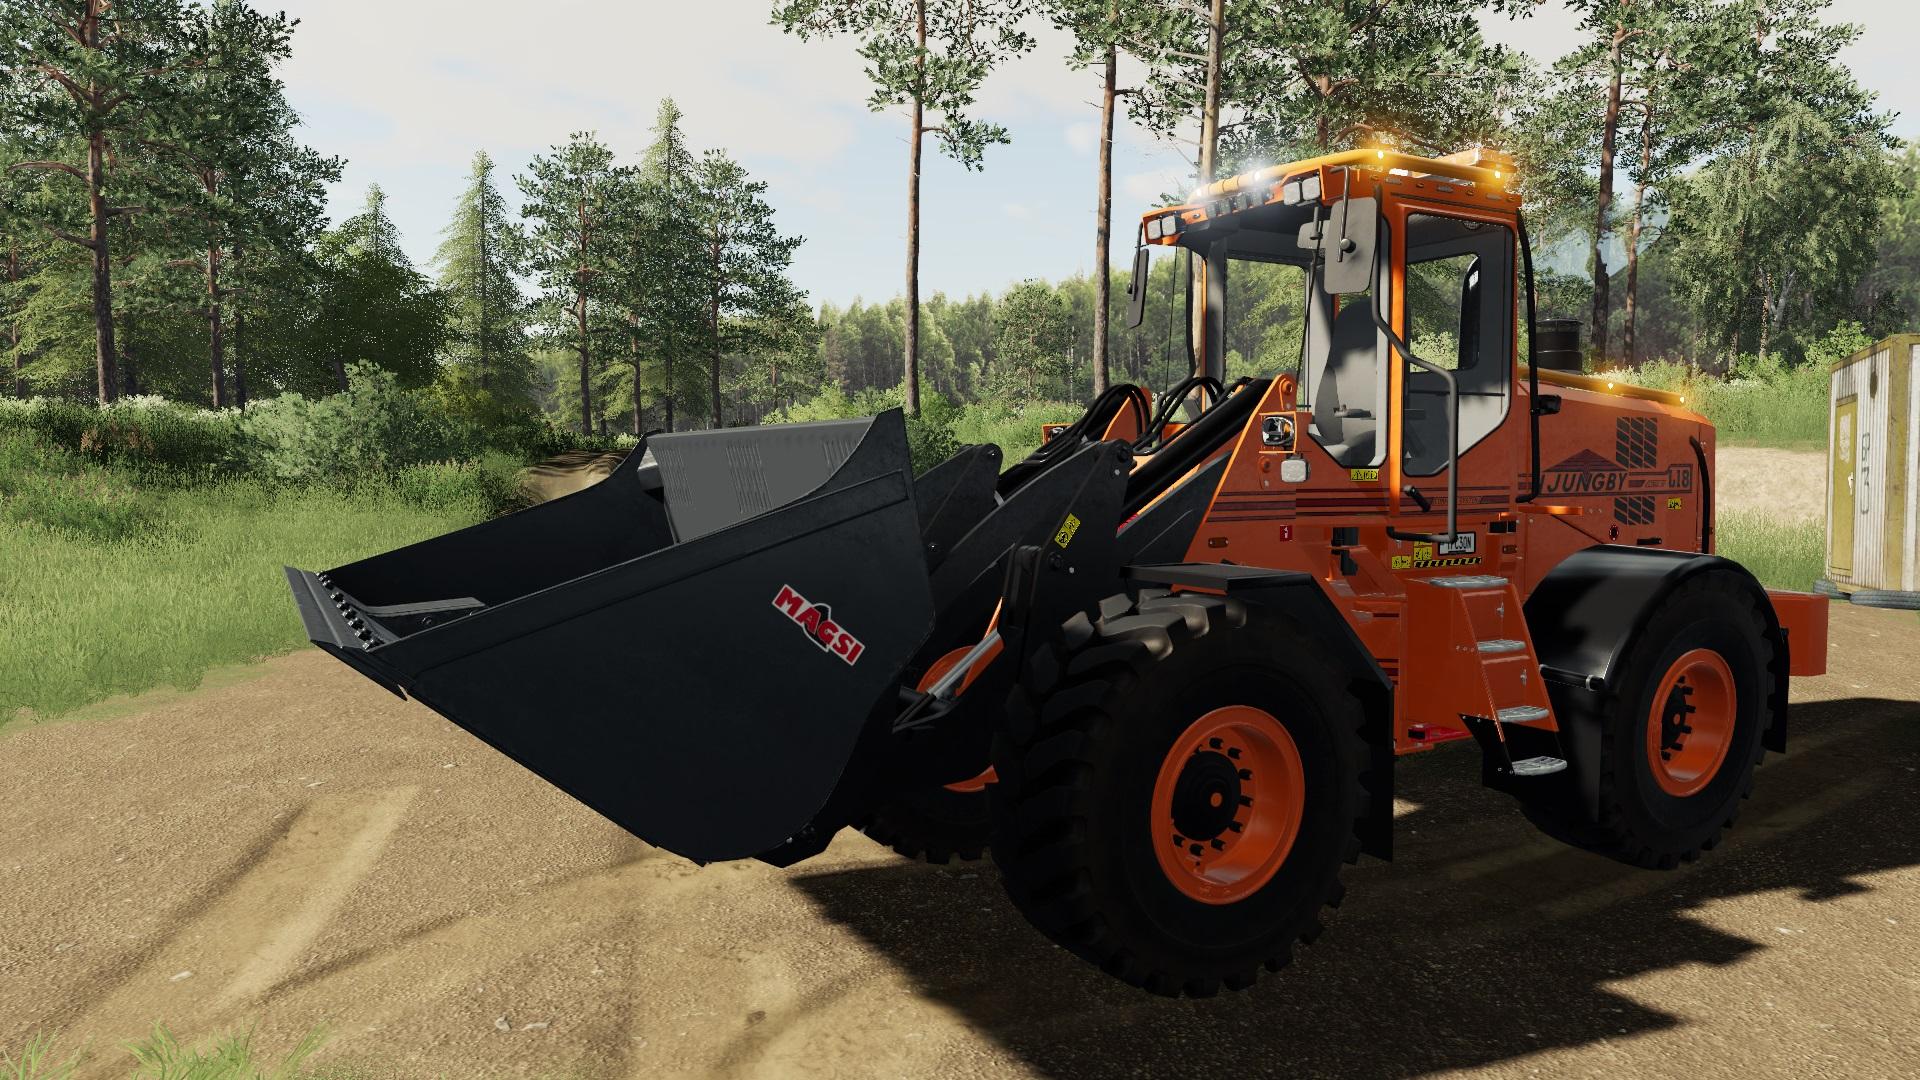 Мод на трактор Ljungby v1.0 для Farming Simulator 2019